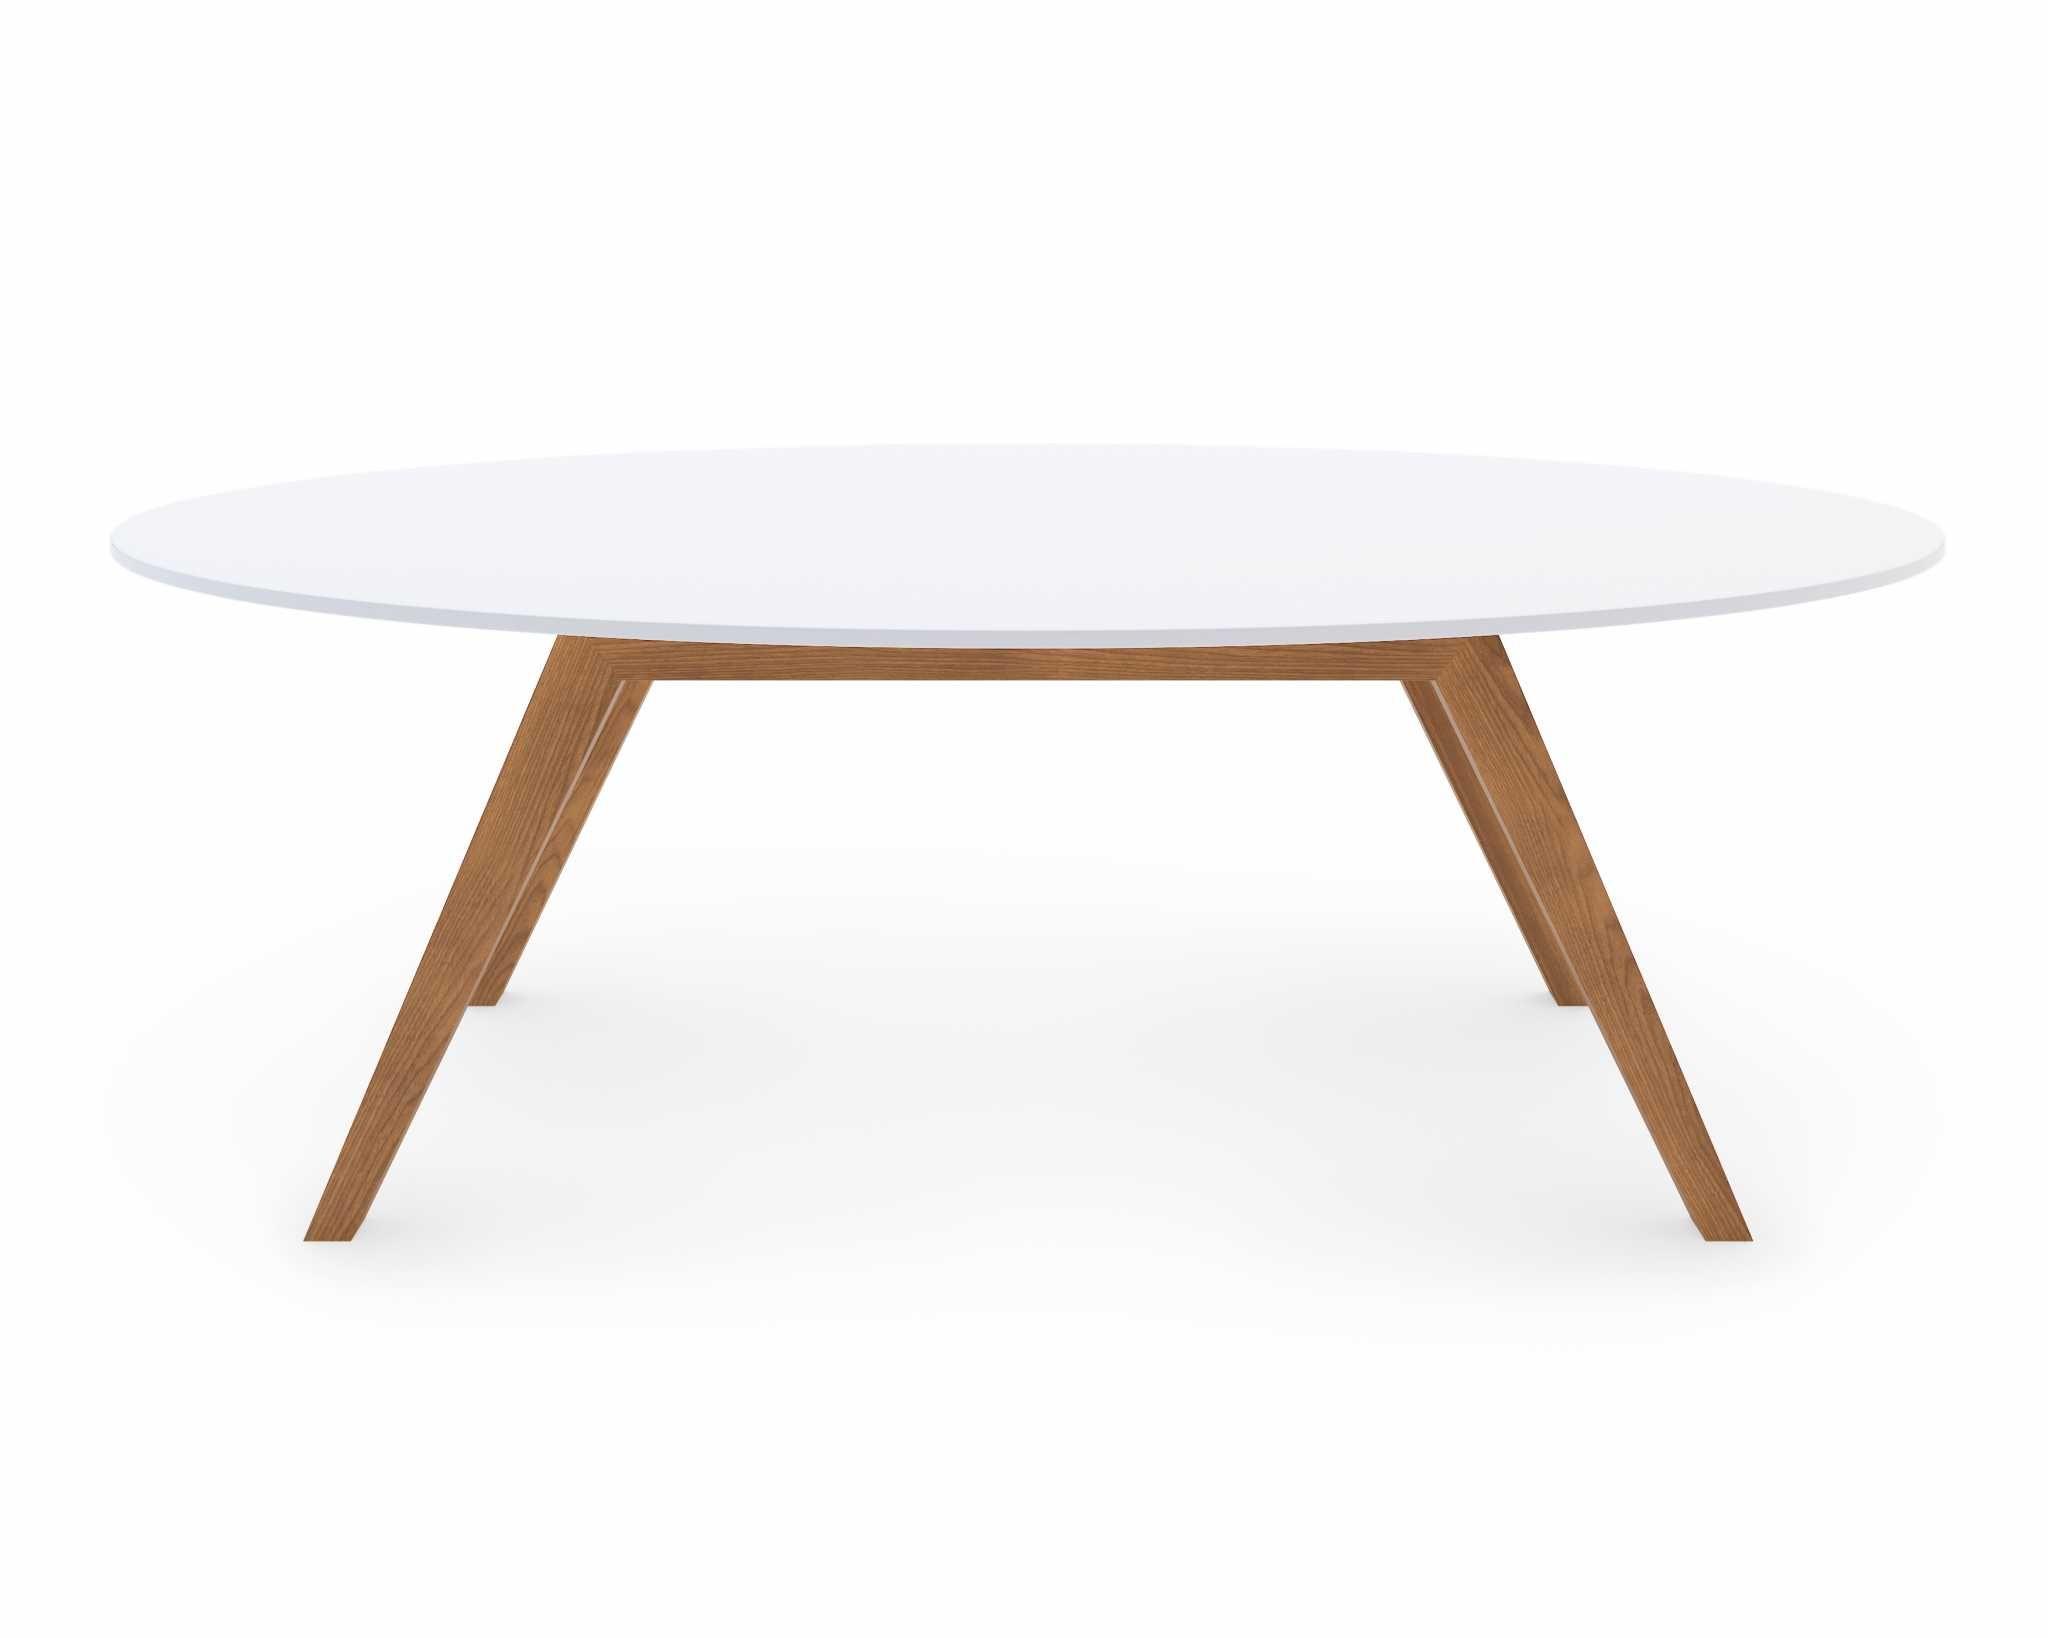 Dolf Coffee Table Rove Kure Scandinavian Design Mid Century Coffee Table Oval Coffee Tables Coffee Table [ 1638 x 2048 Pixel ]